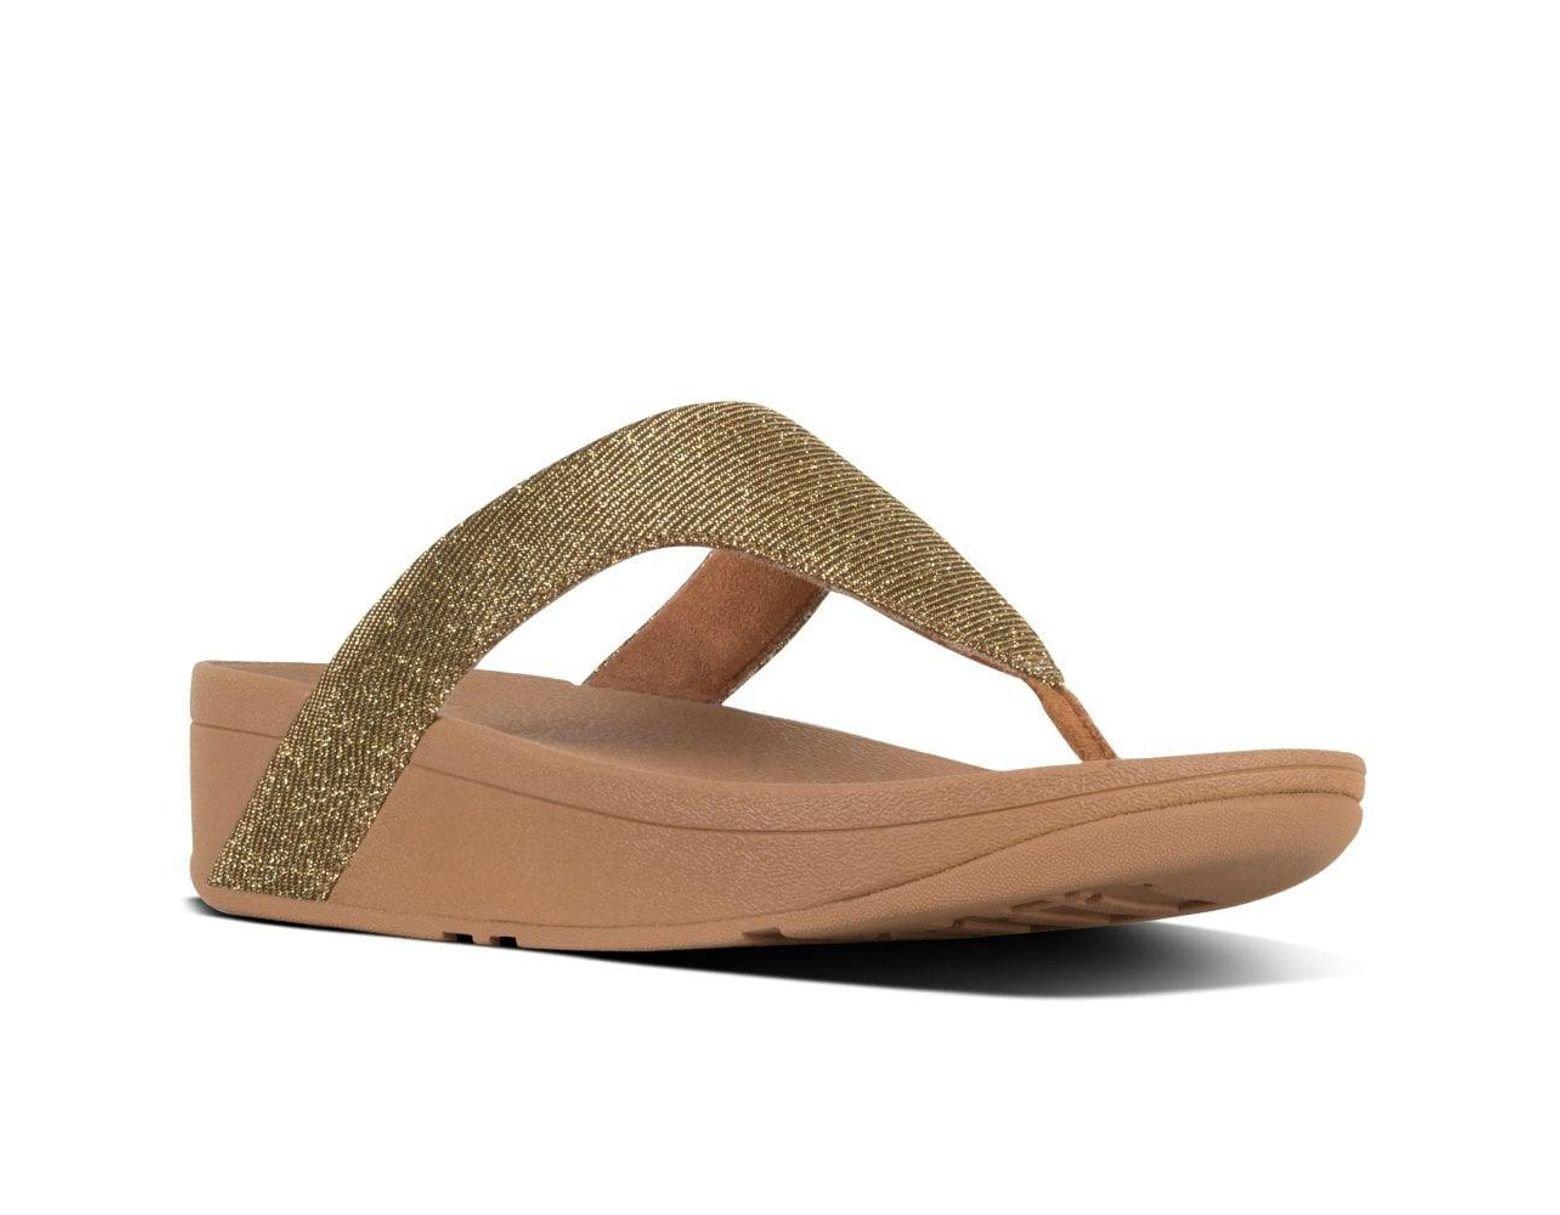 a7d3c401d Lyst - Fitflop Lottie Glitzy Womens Toe Post Sandals